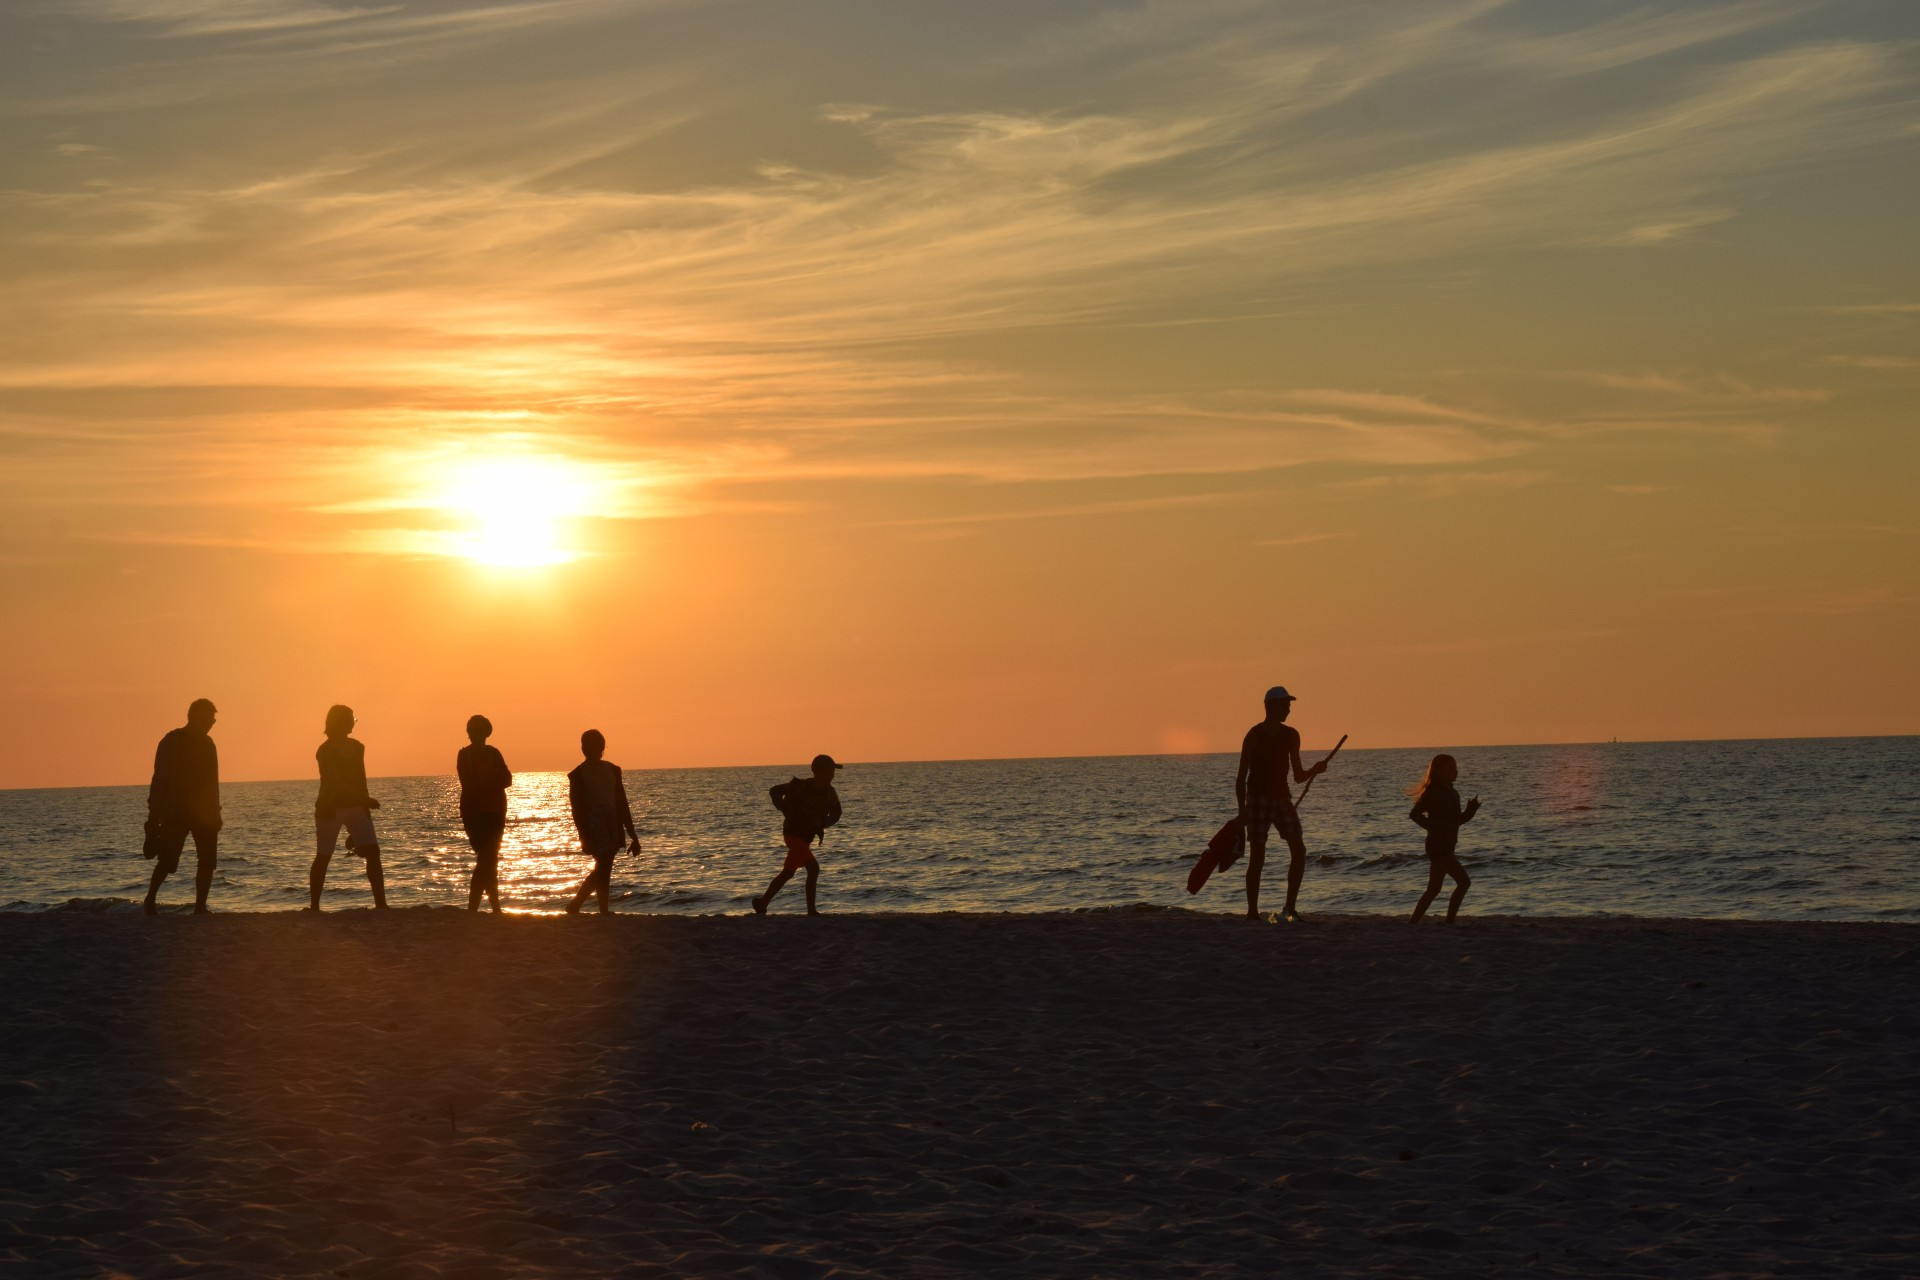 Kopalino, plaża. Nieopowiedziane historie [FOTOREPORTAŻ] 5